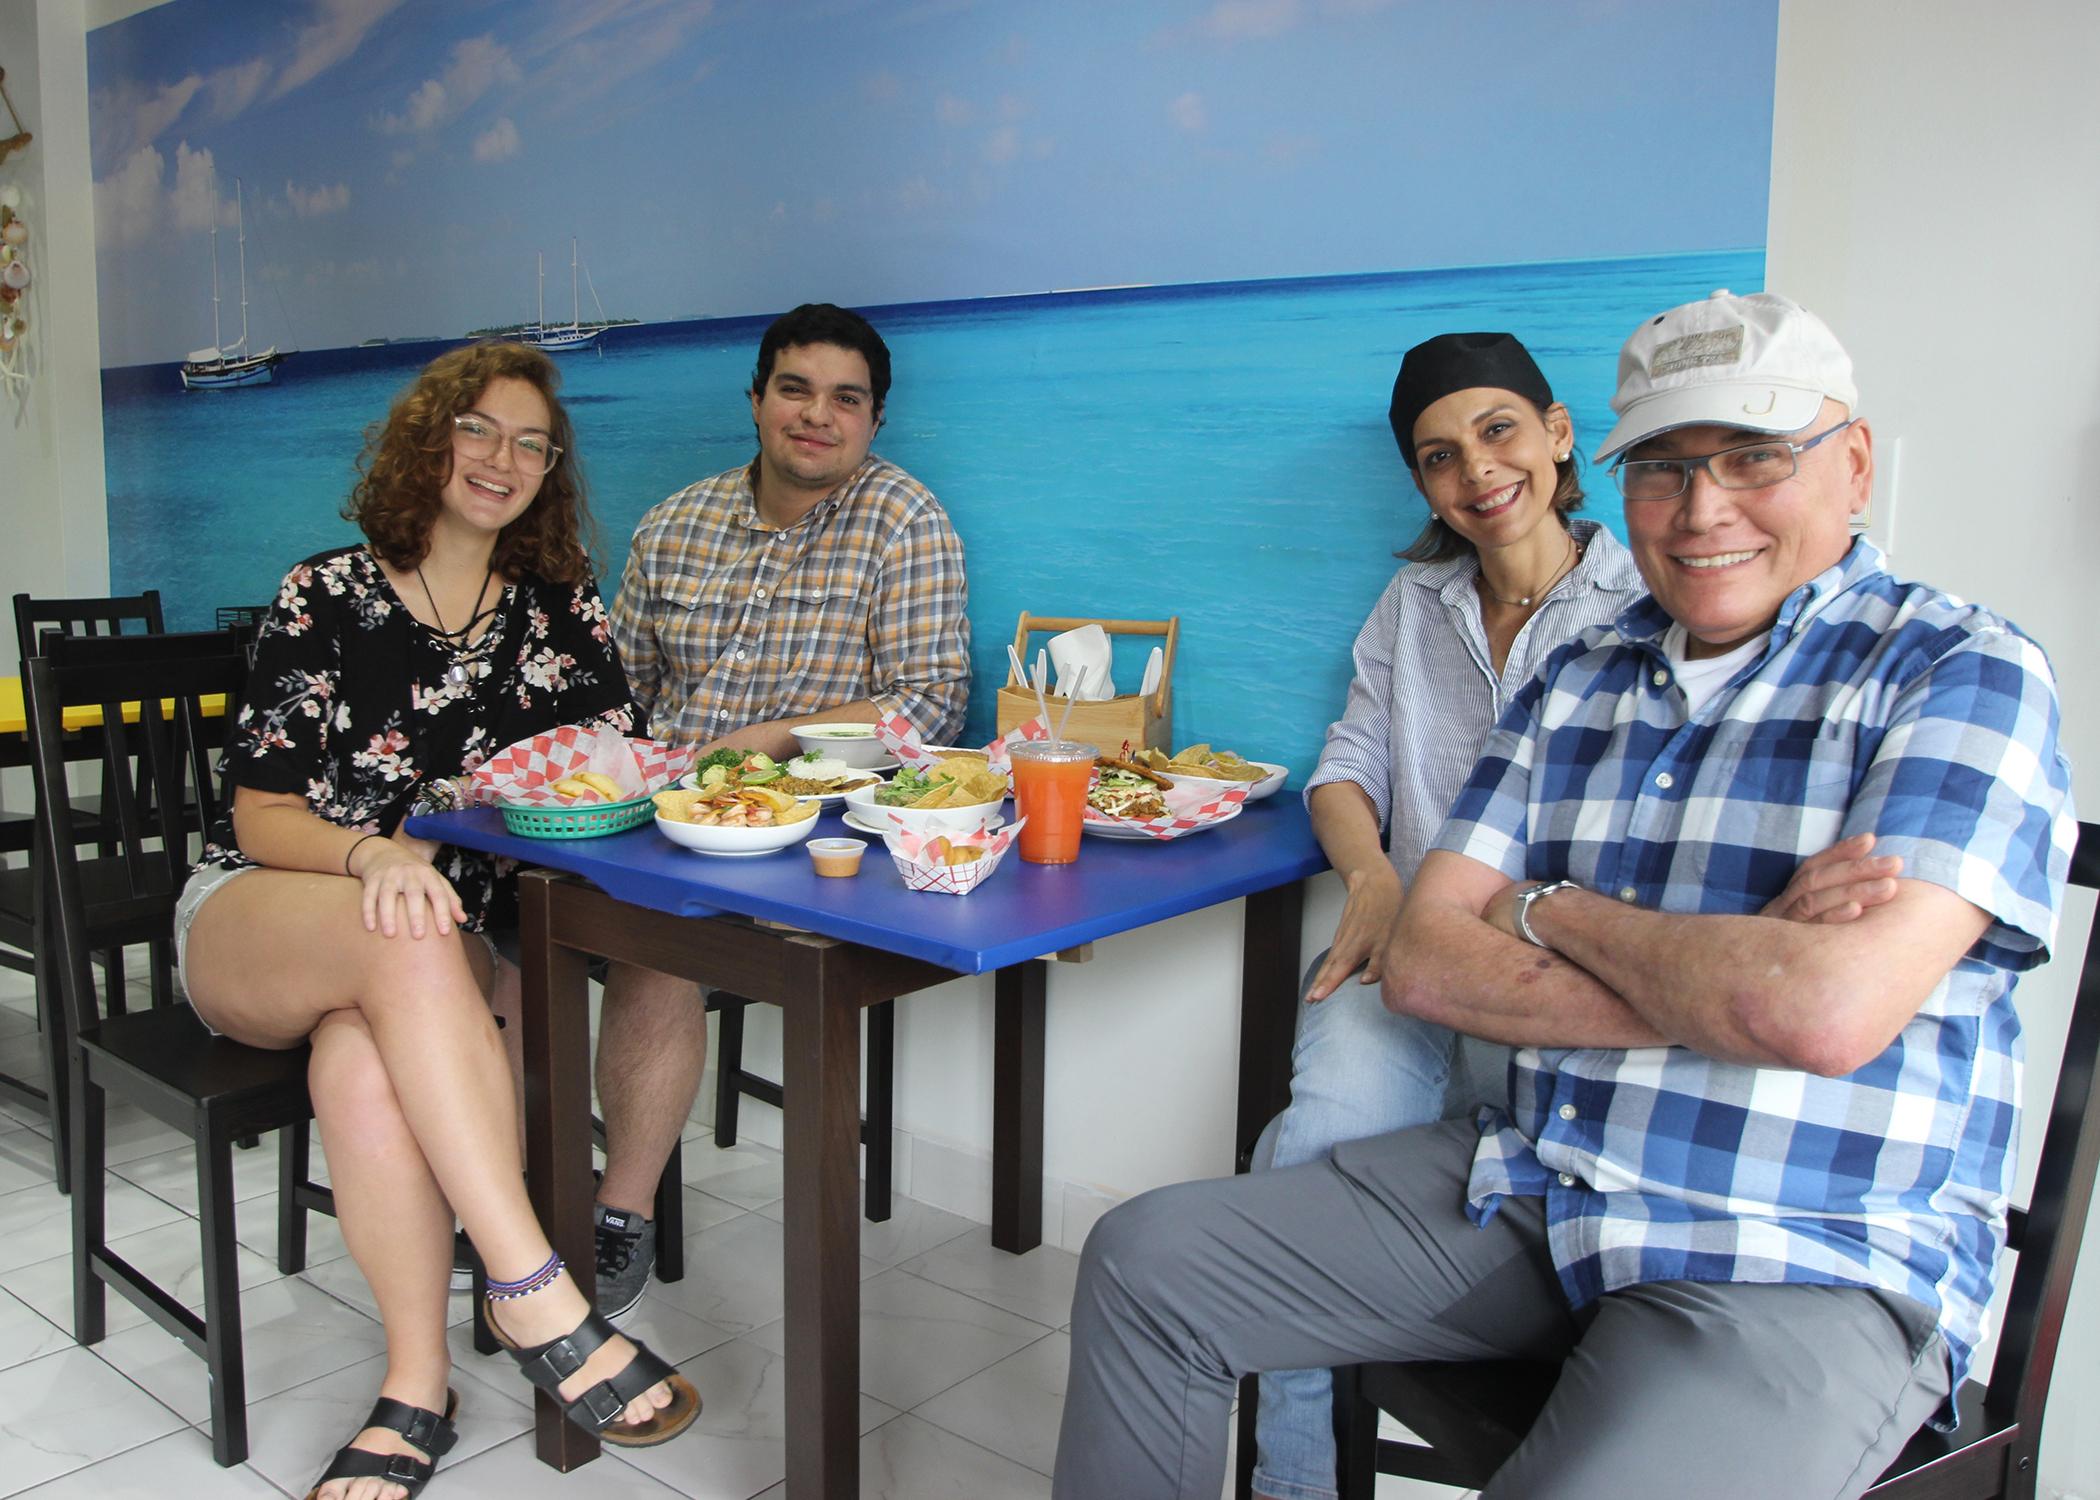 At Pala´a in Ardmore (from left): Jana Brcek Ferreira, Ivan Brcek, Cira Ferreira, and Levi Hernandez.